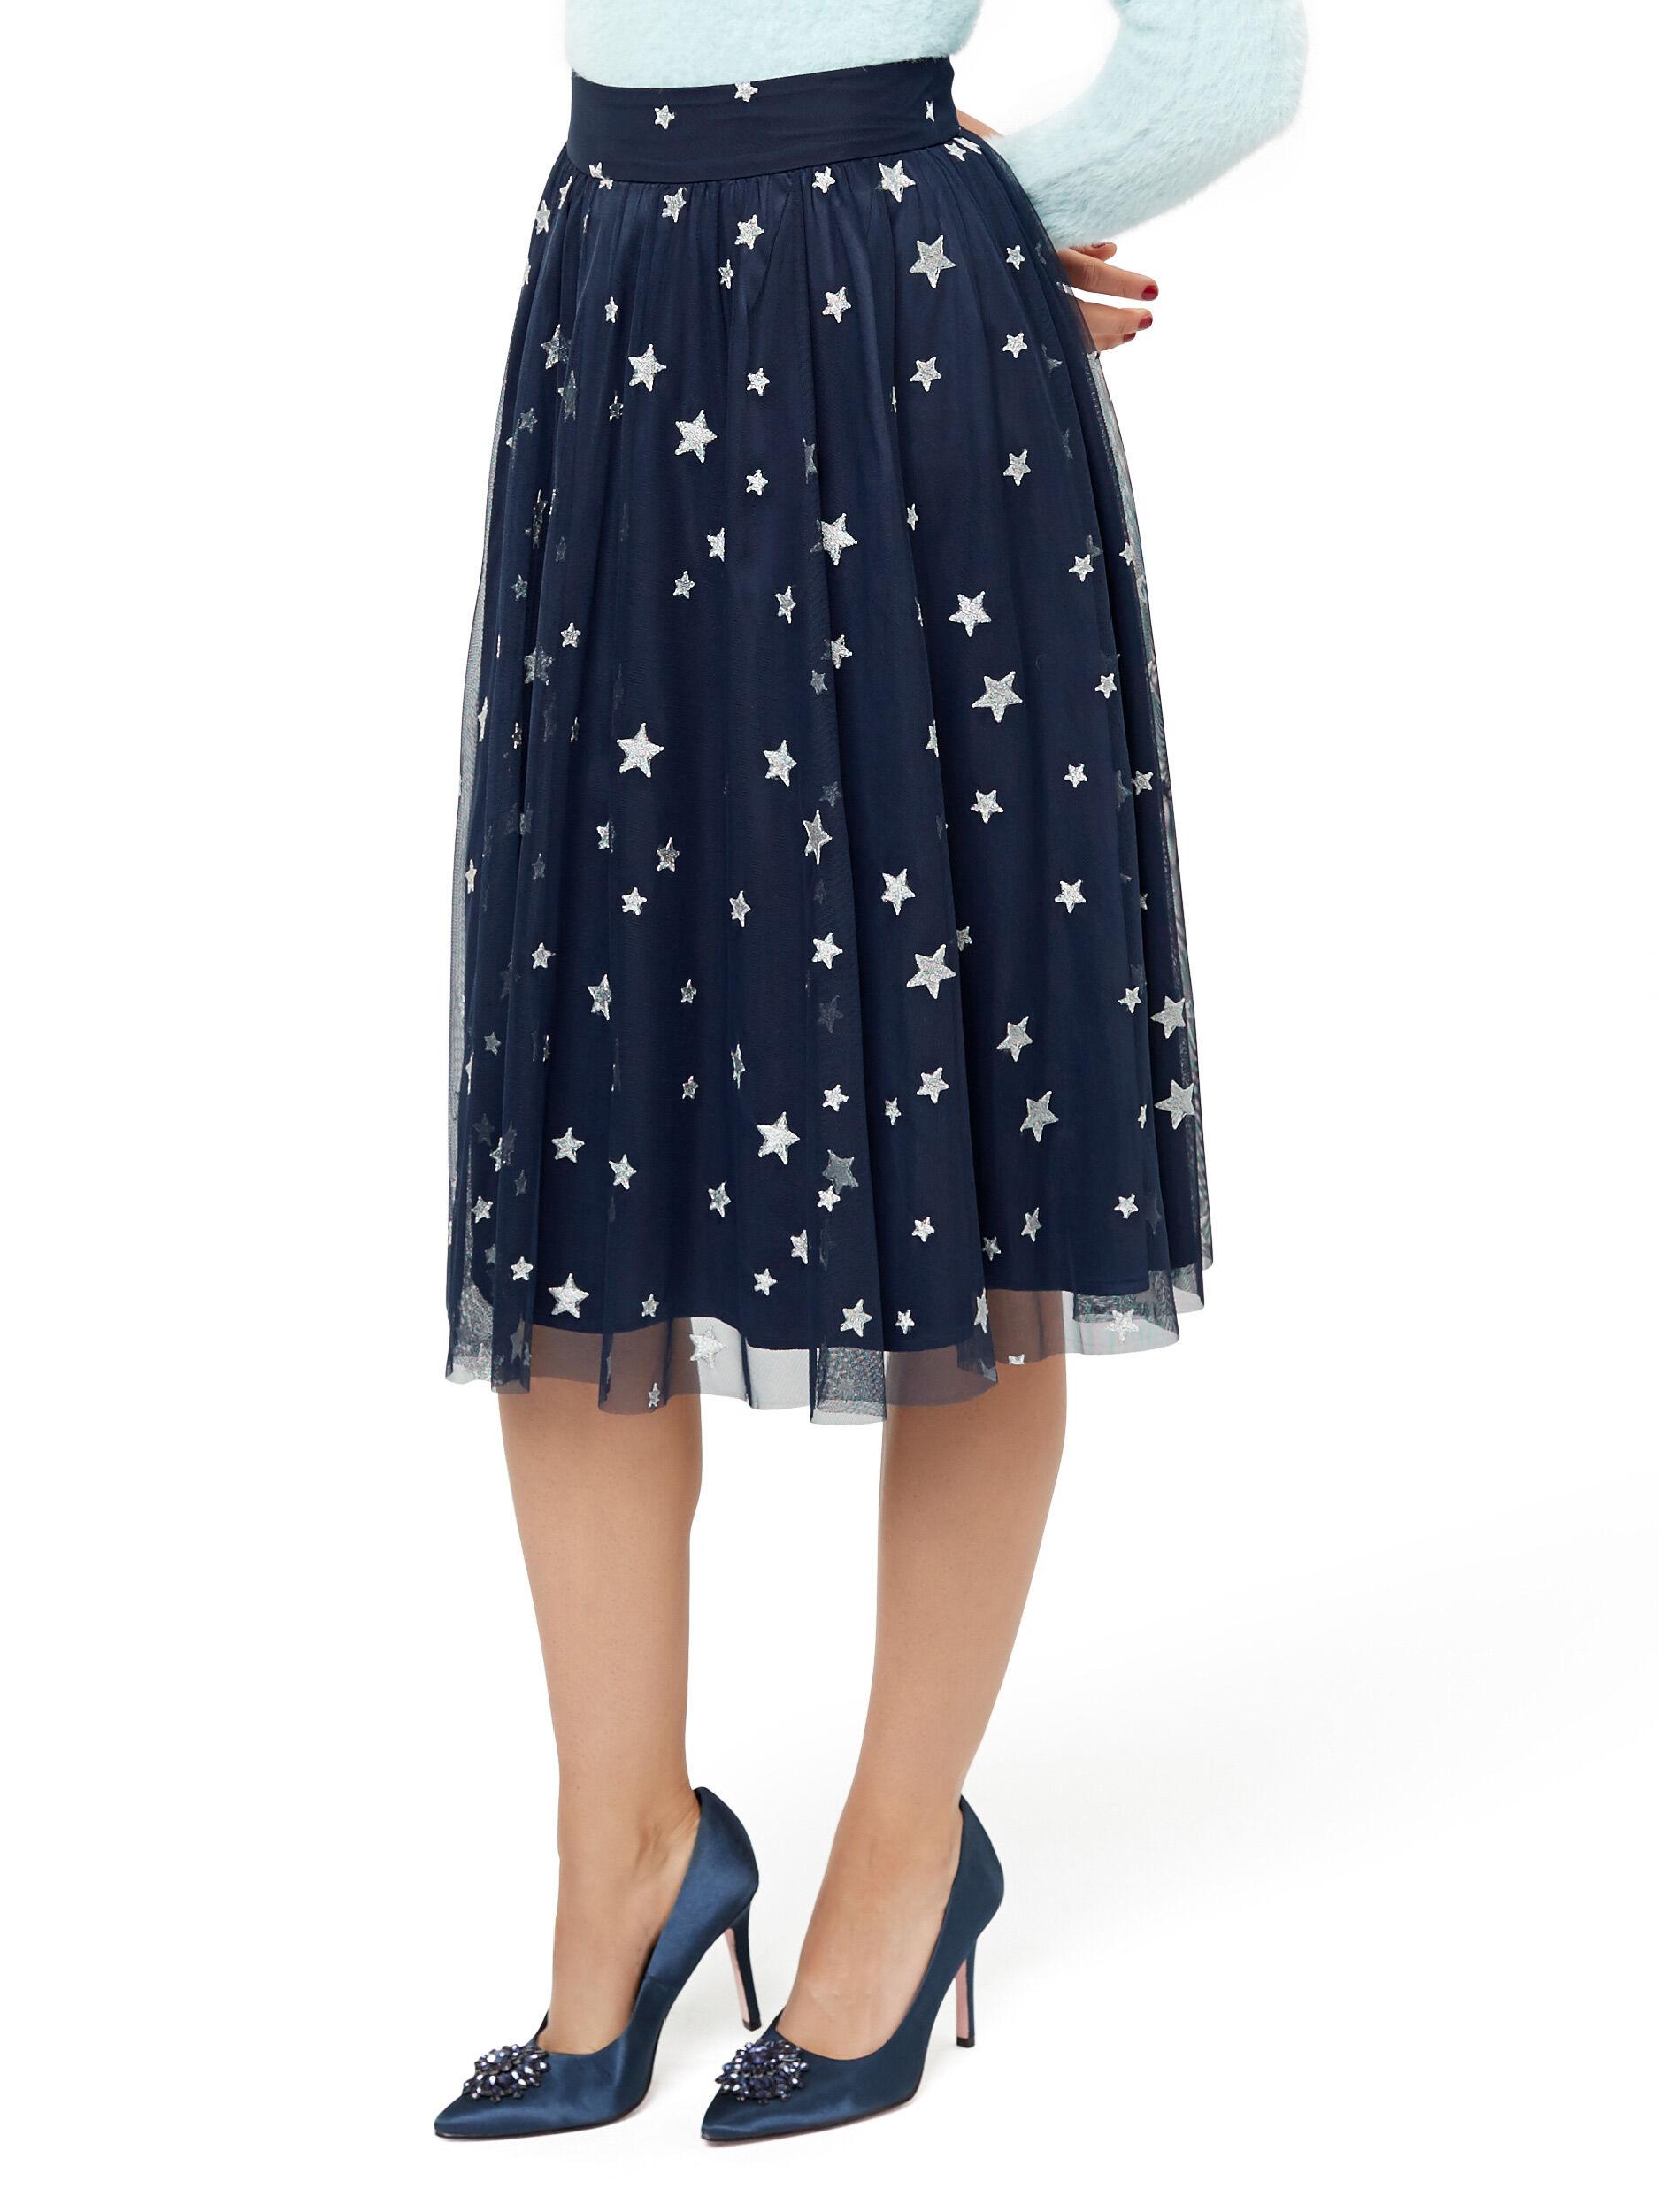 Wish Upon A Star Skirt